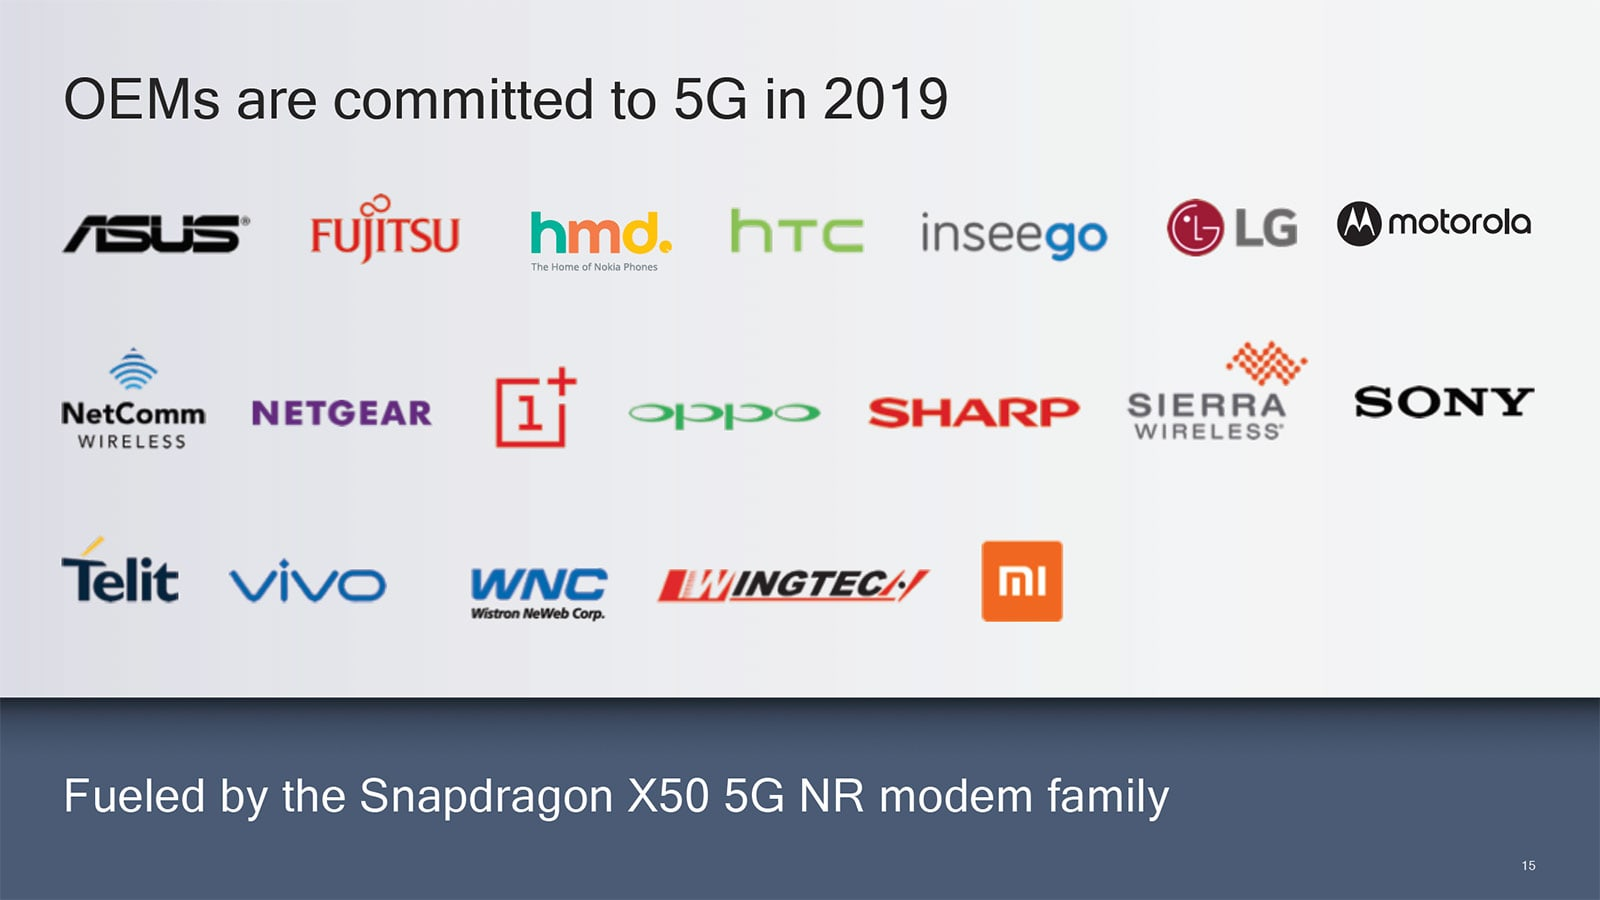 Qualcomm's 5G OEM partners